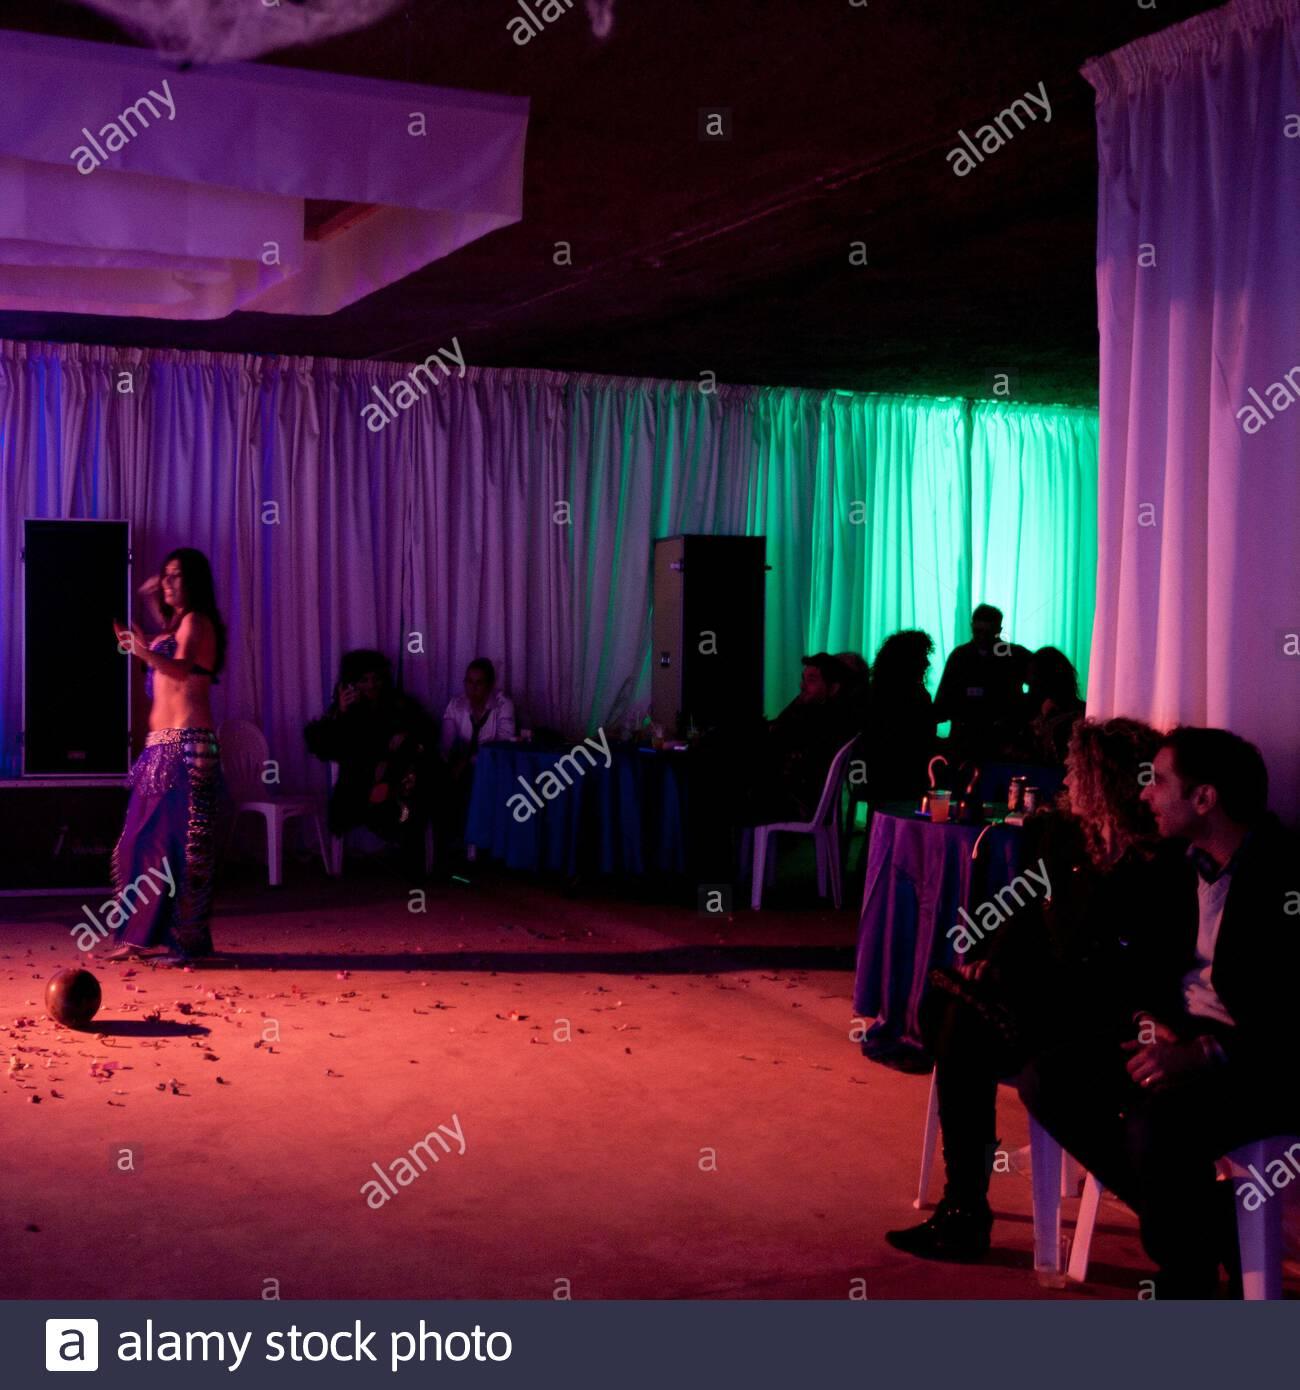 libanon nacht club